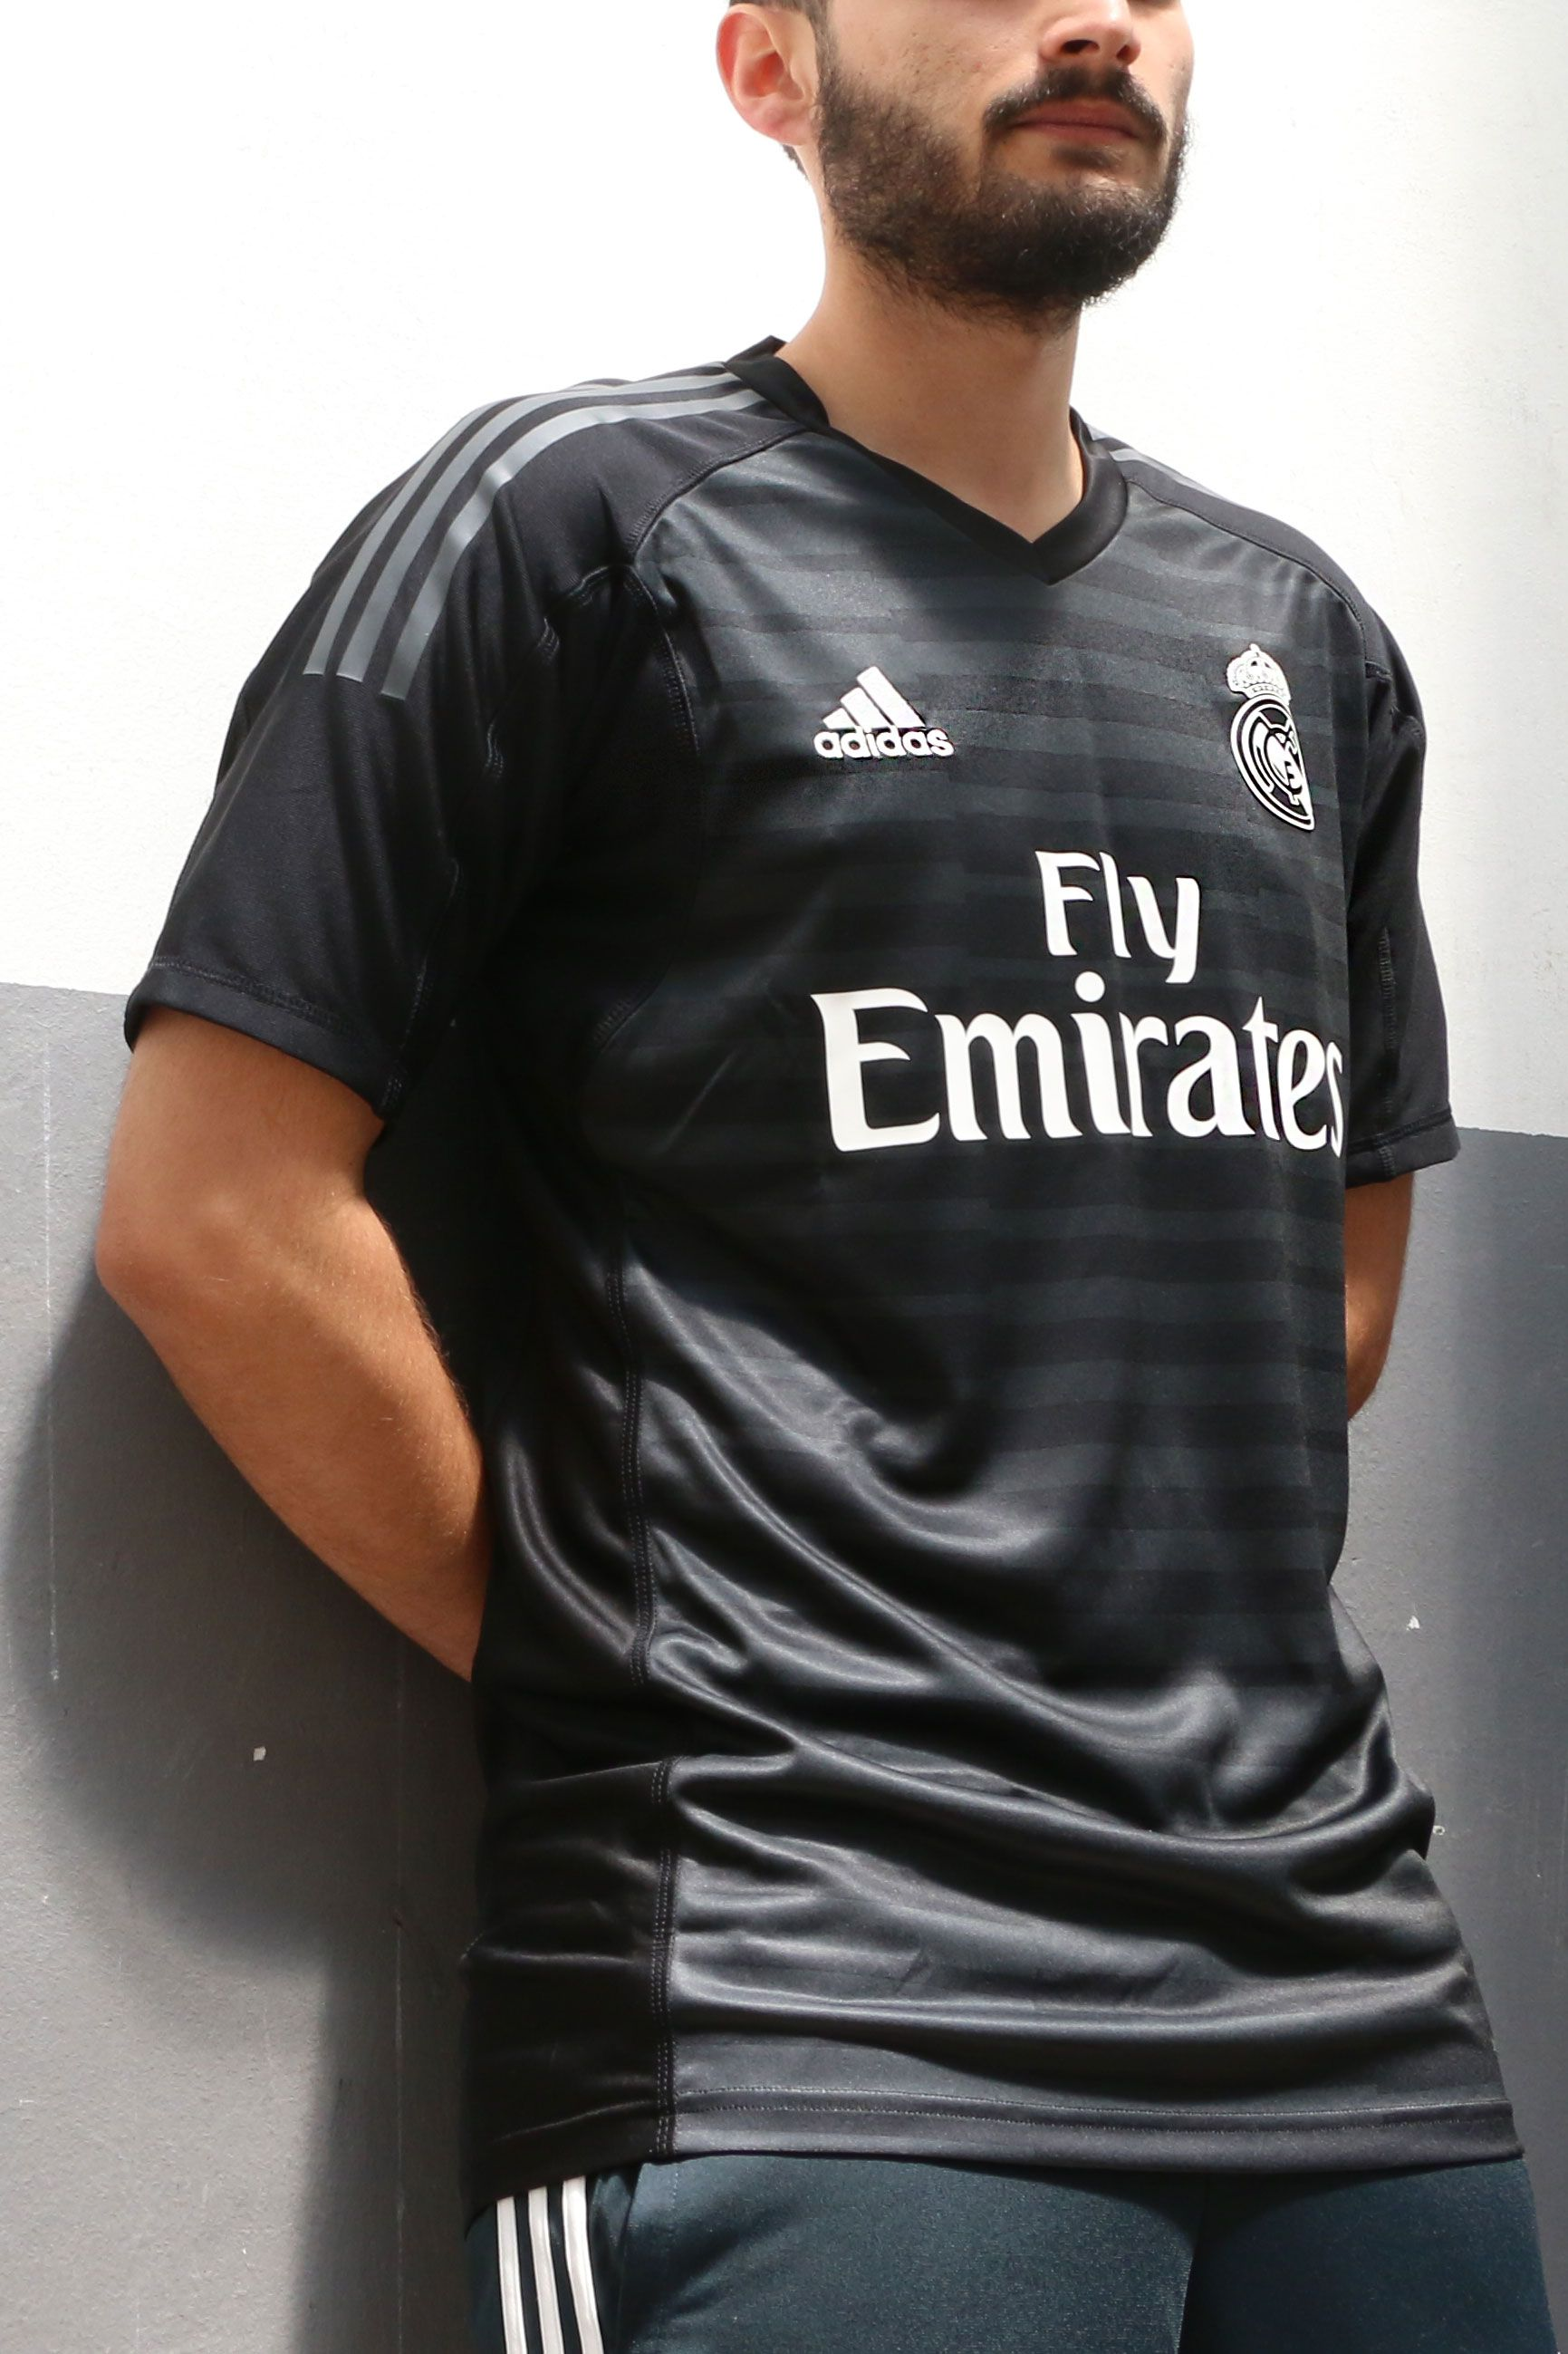 fb69158118db0 Camiseta de portero Real Madrid 2018 - 2019 - negra